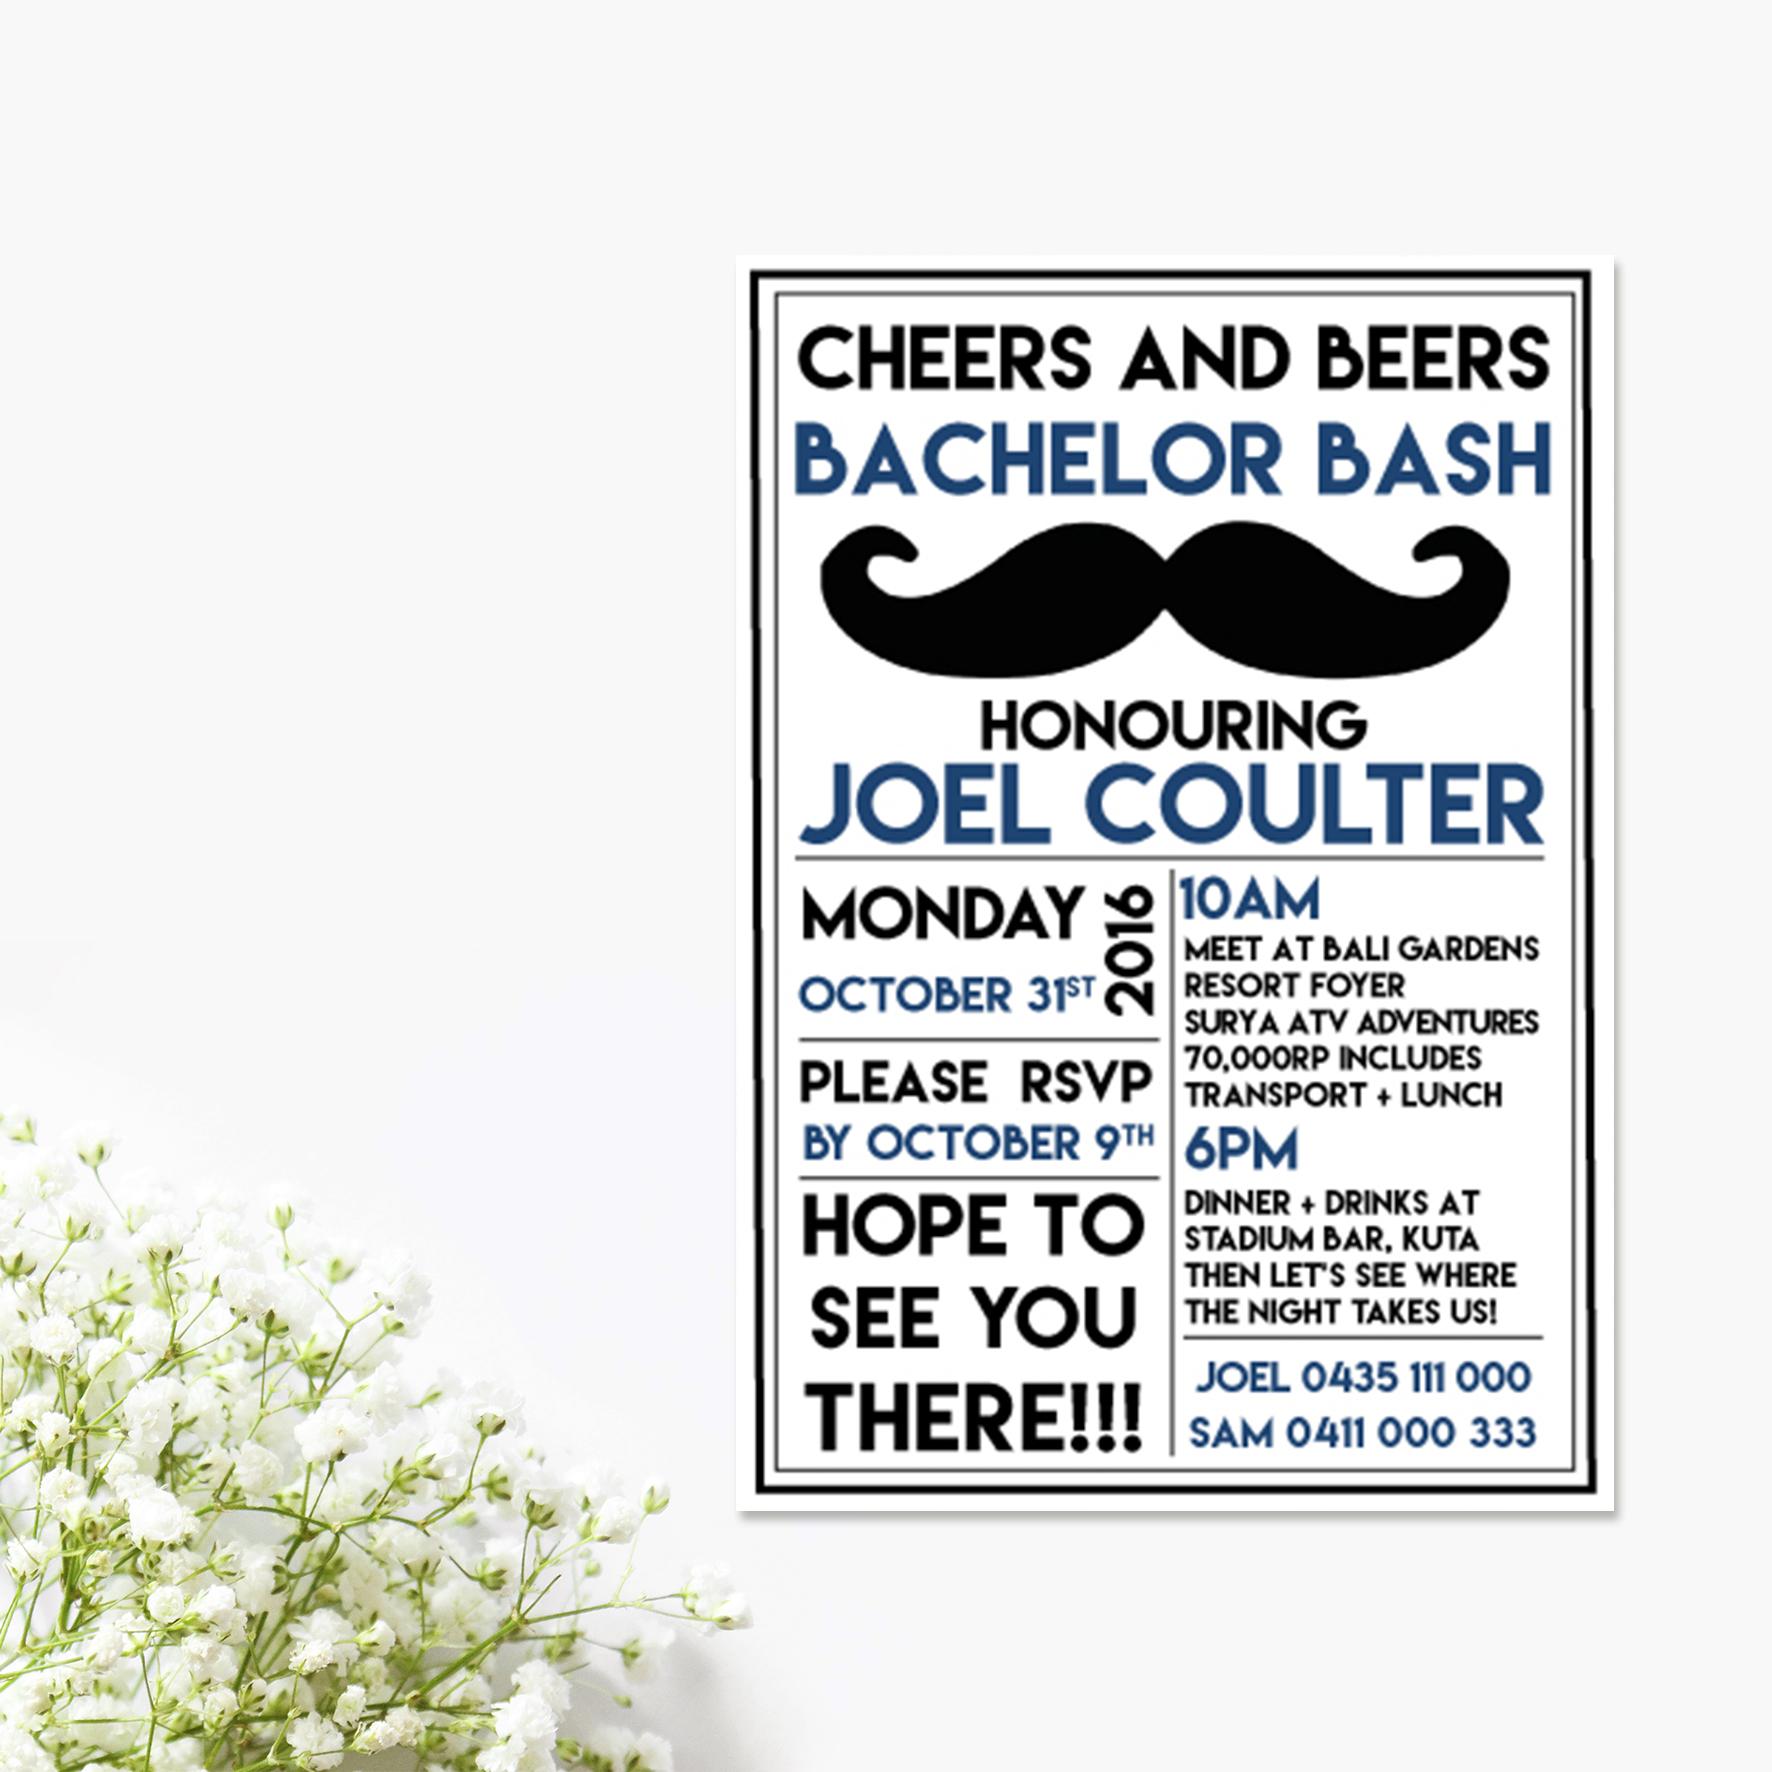 Cheers + Beers Bucks Invitation